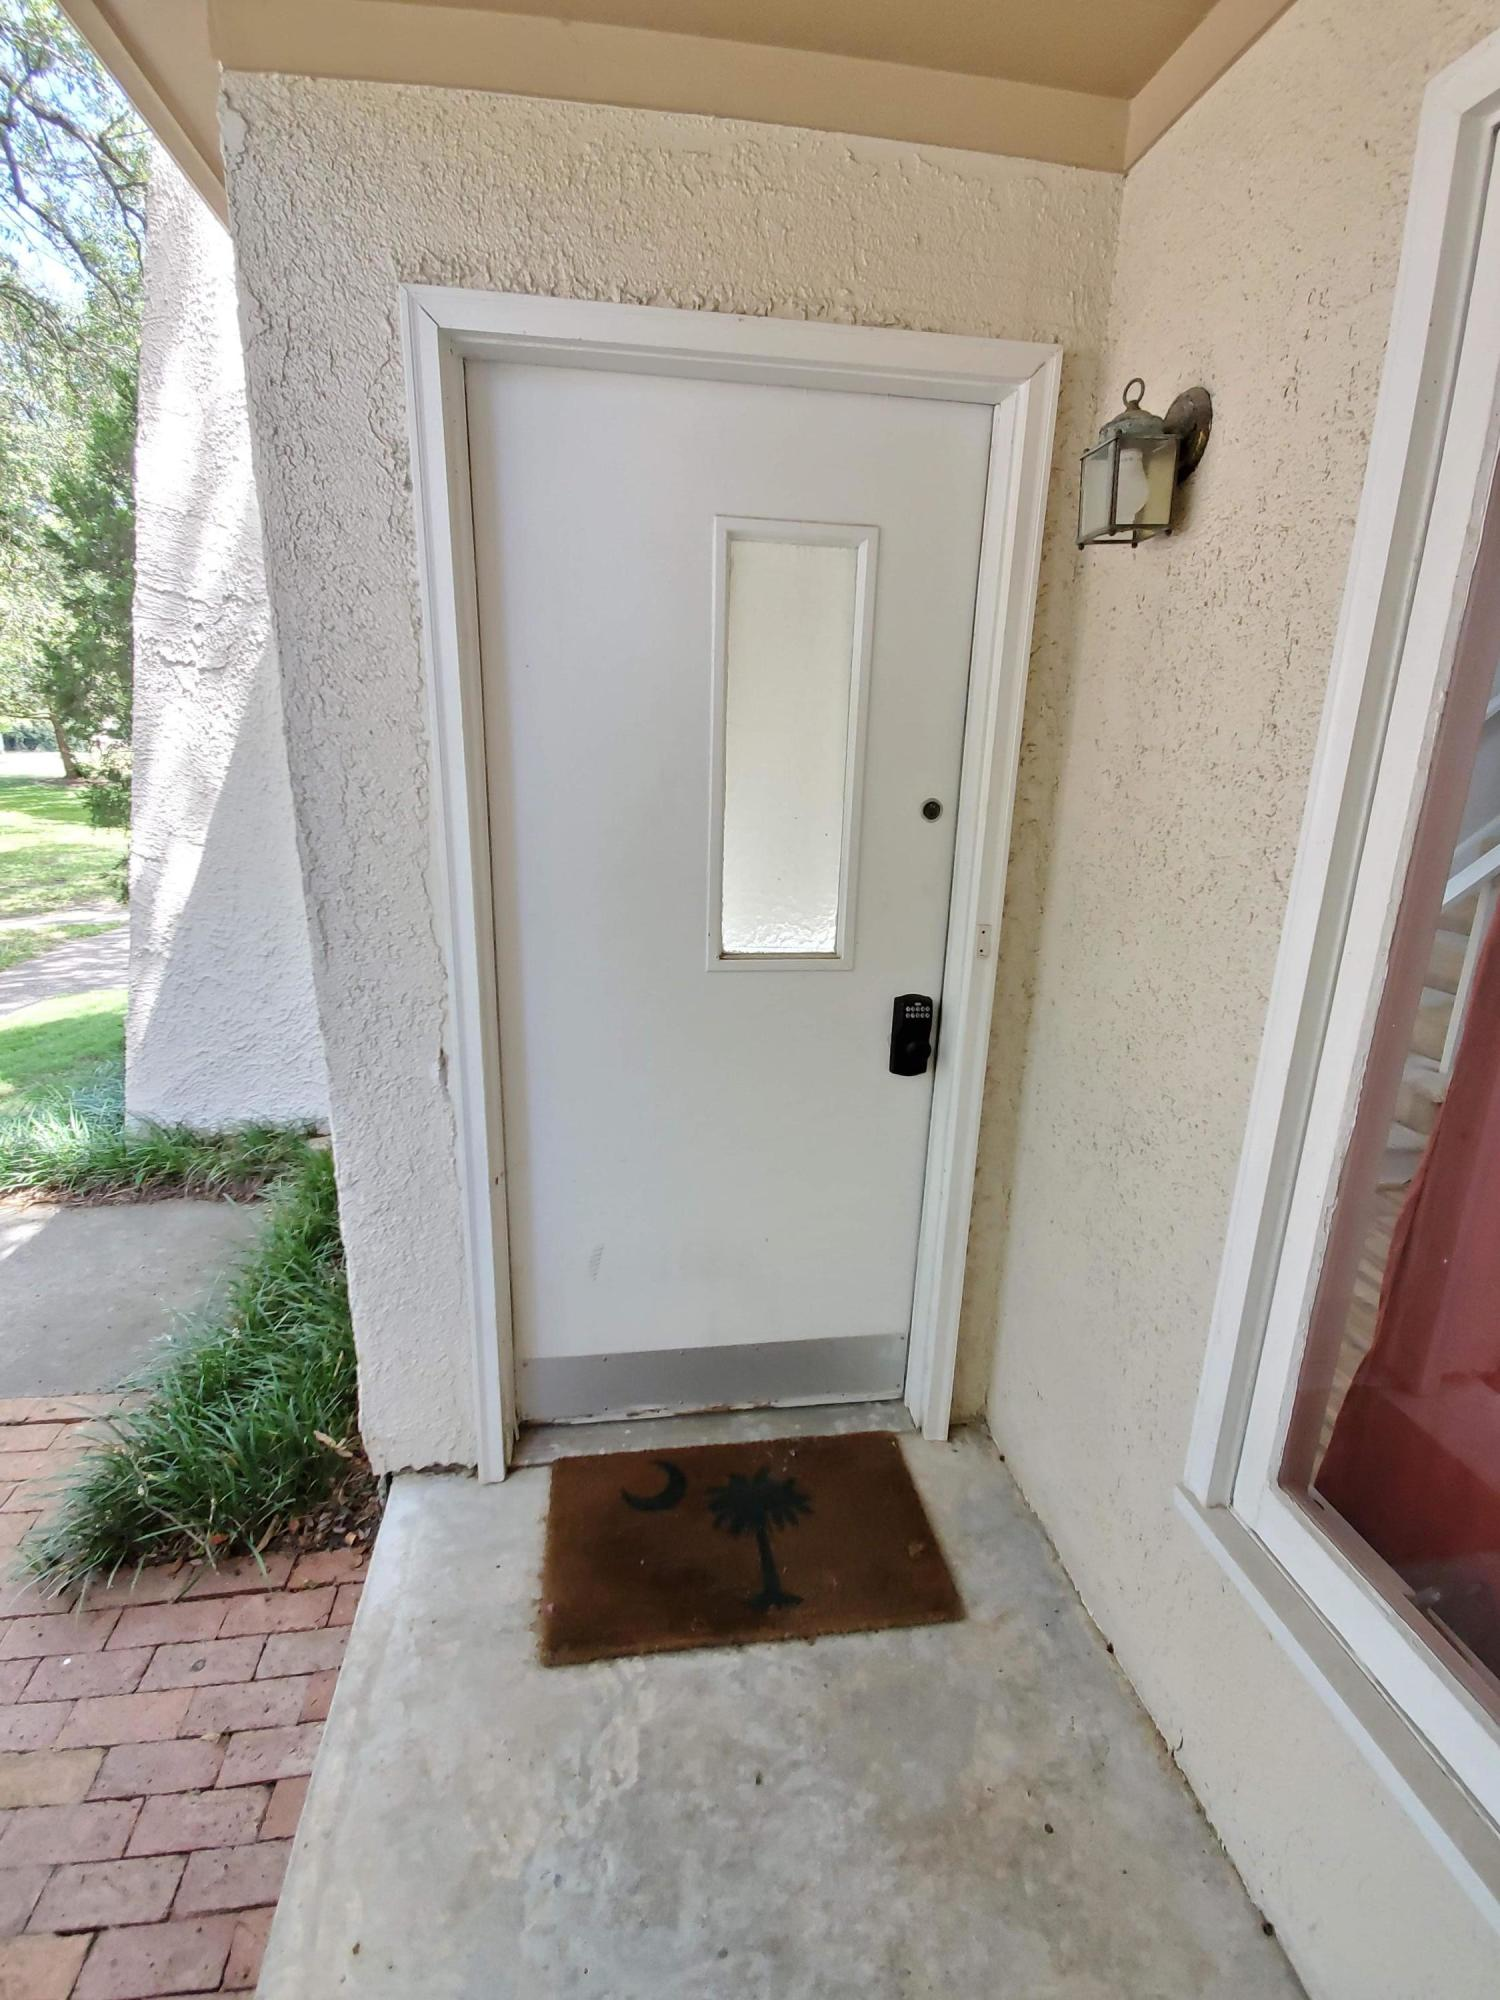 Snee Farm Homes For Sale - 105 Ventura, Mount Pleasant, SC - 25